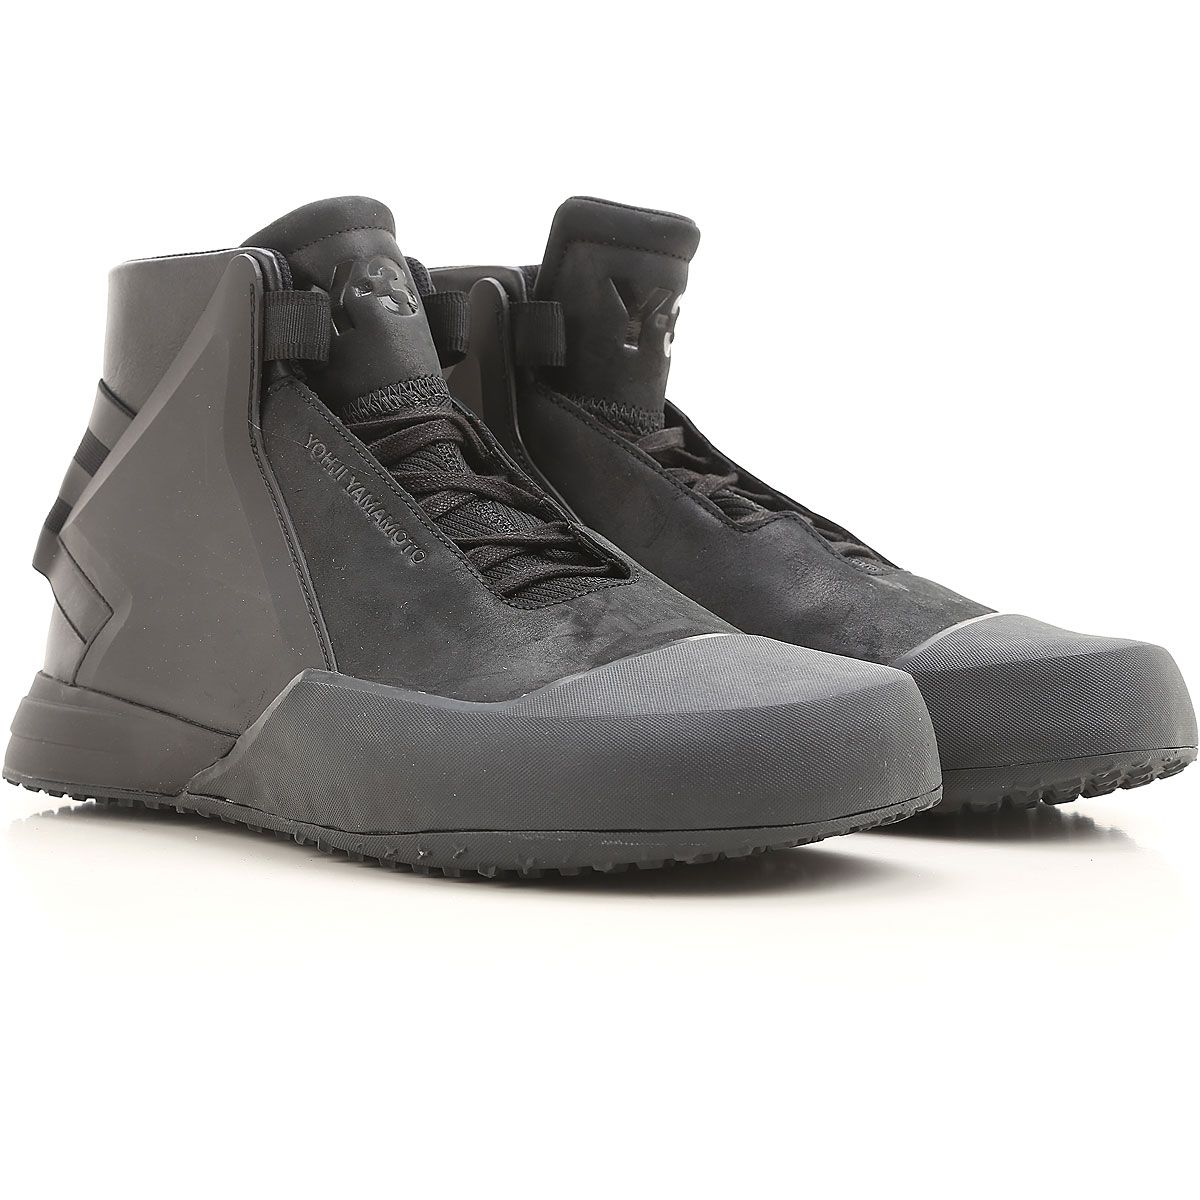 a2107da0740cd Mens Shoes Y3 by Yohji Yamamoto